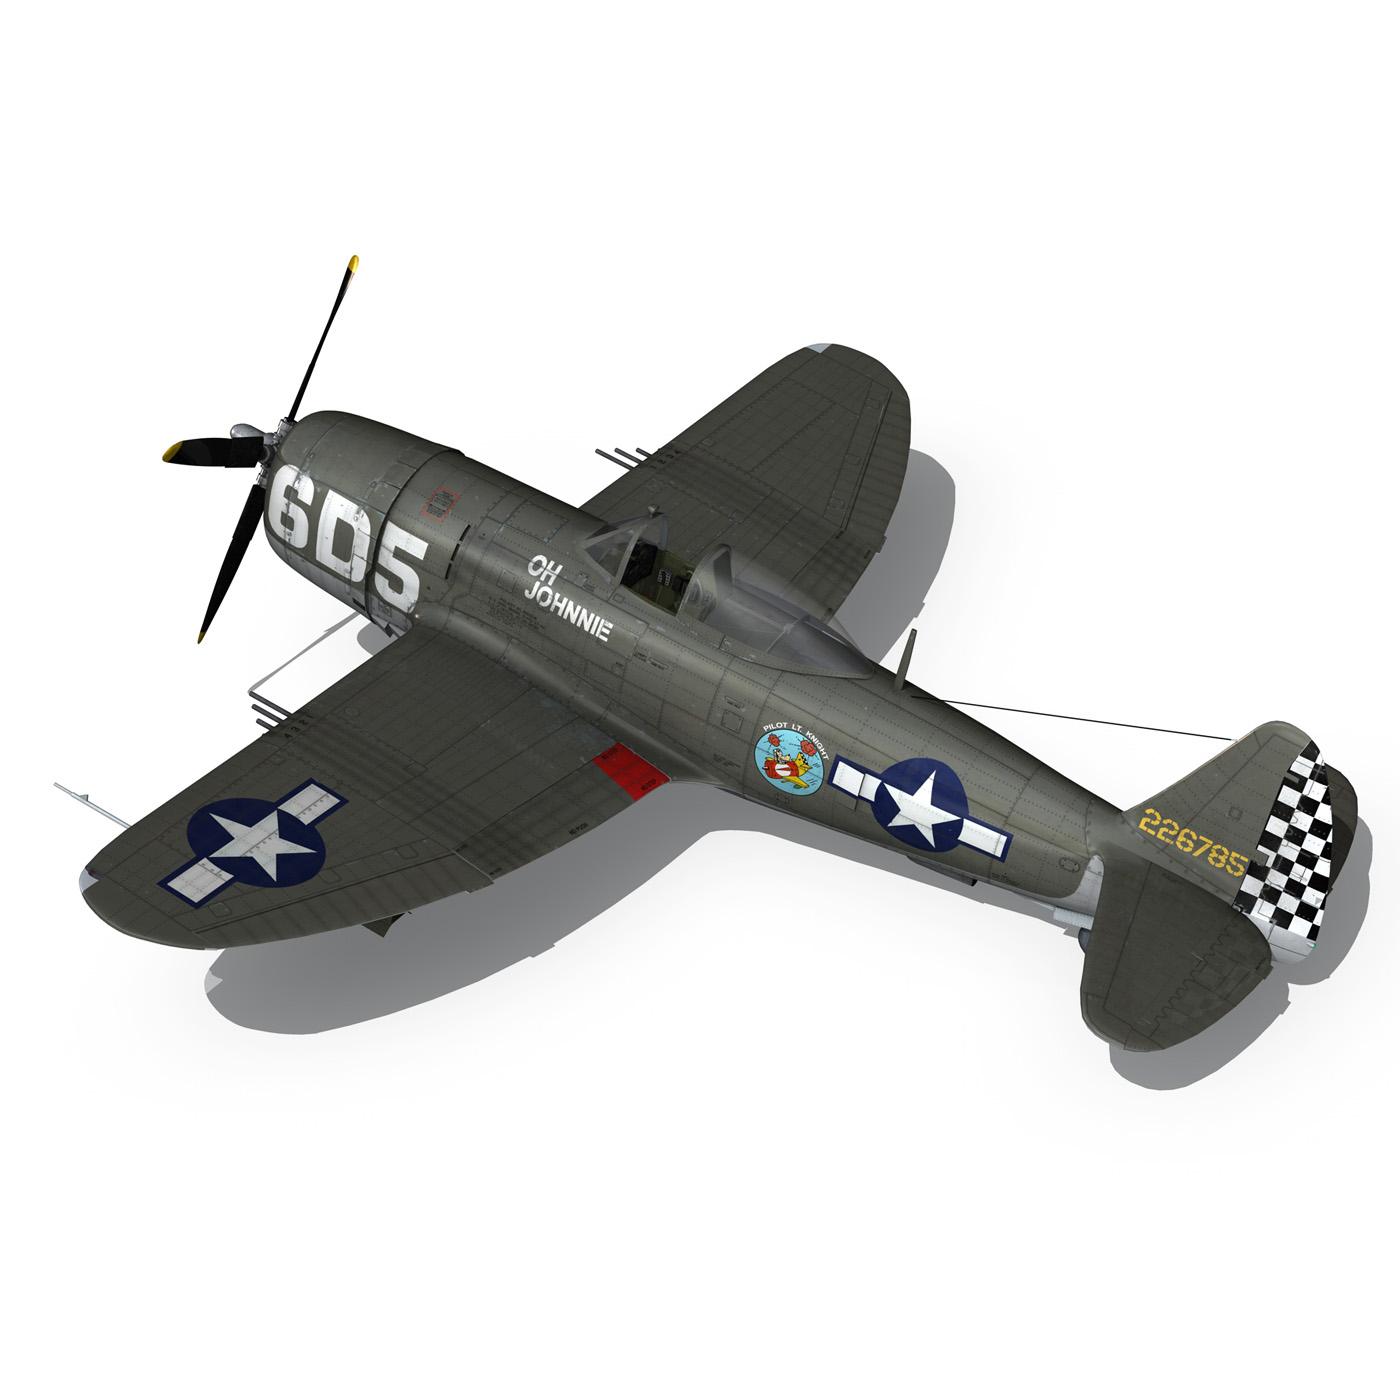 republic p-47 thunderbolt – oh johnnie 3d model fbx c4d lwo obj 274256